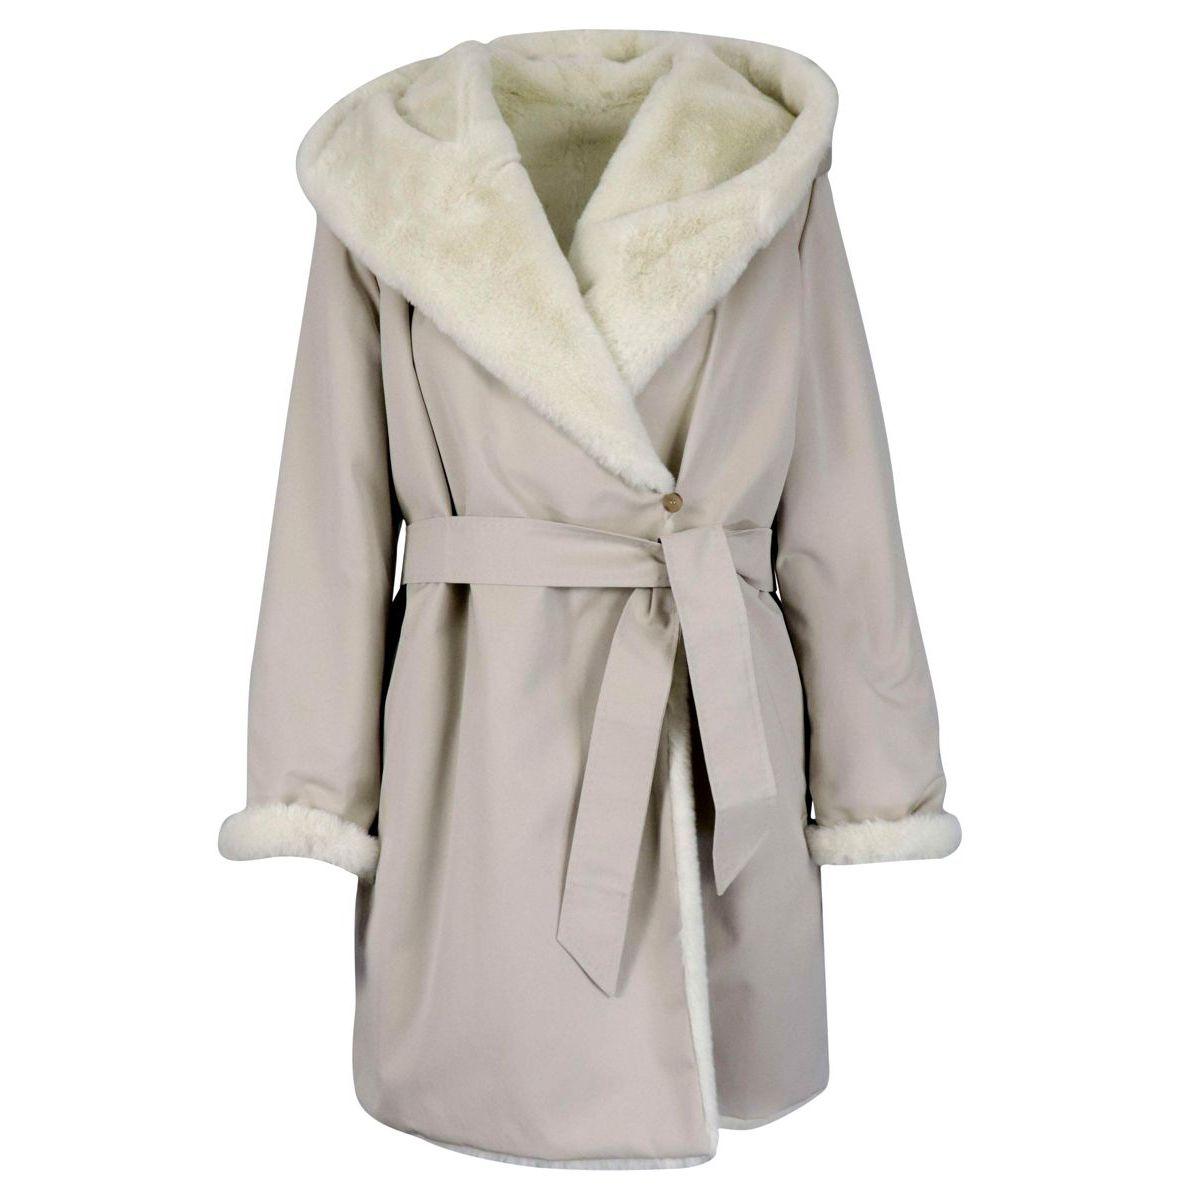 Felice jacket with hood and internal faux fur Cream MAX MARA STUDIO